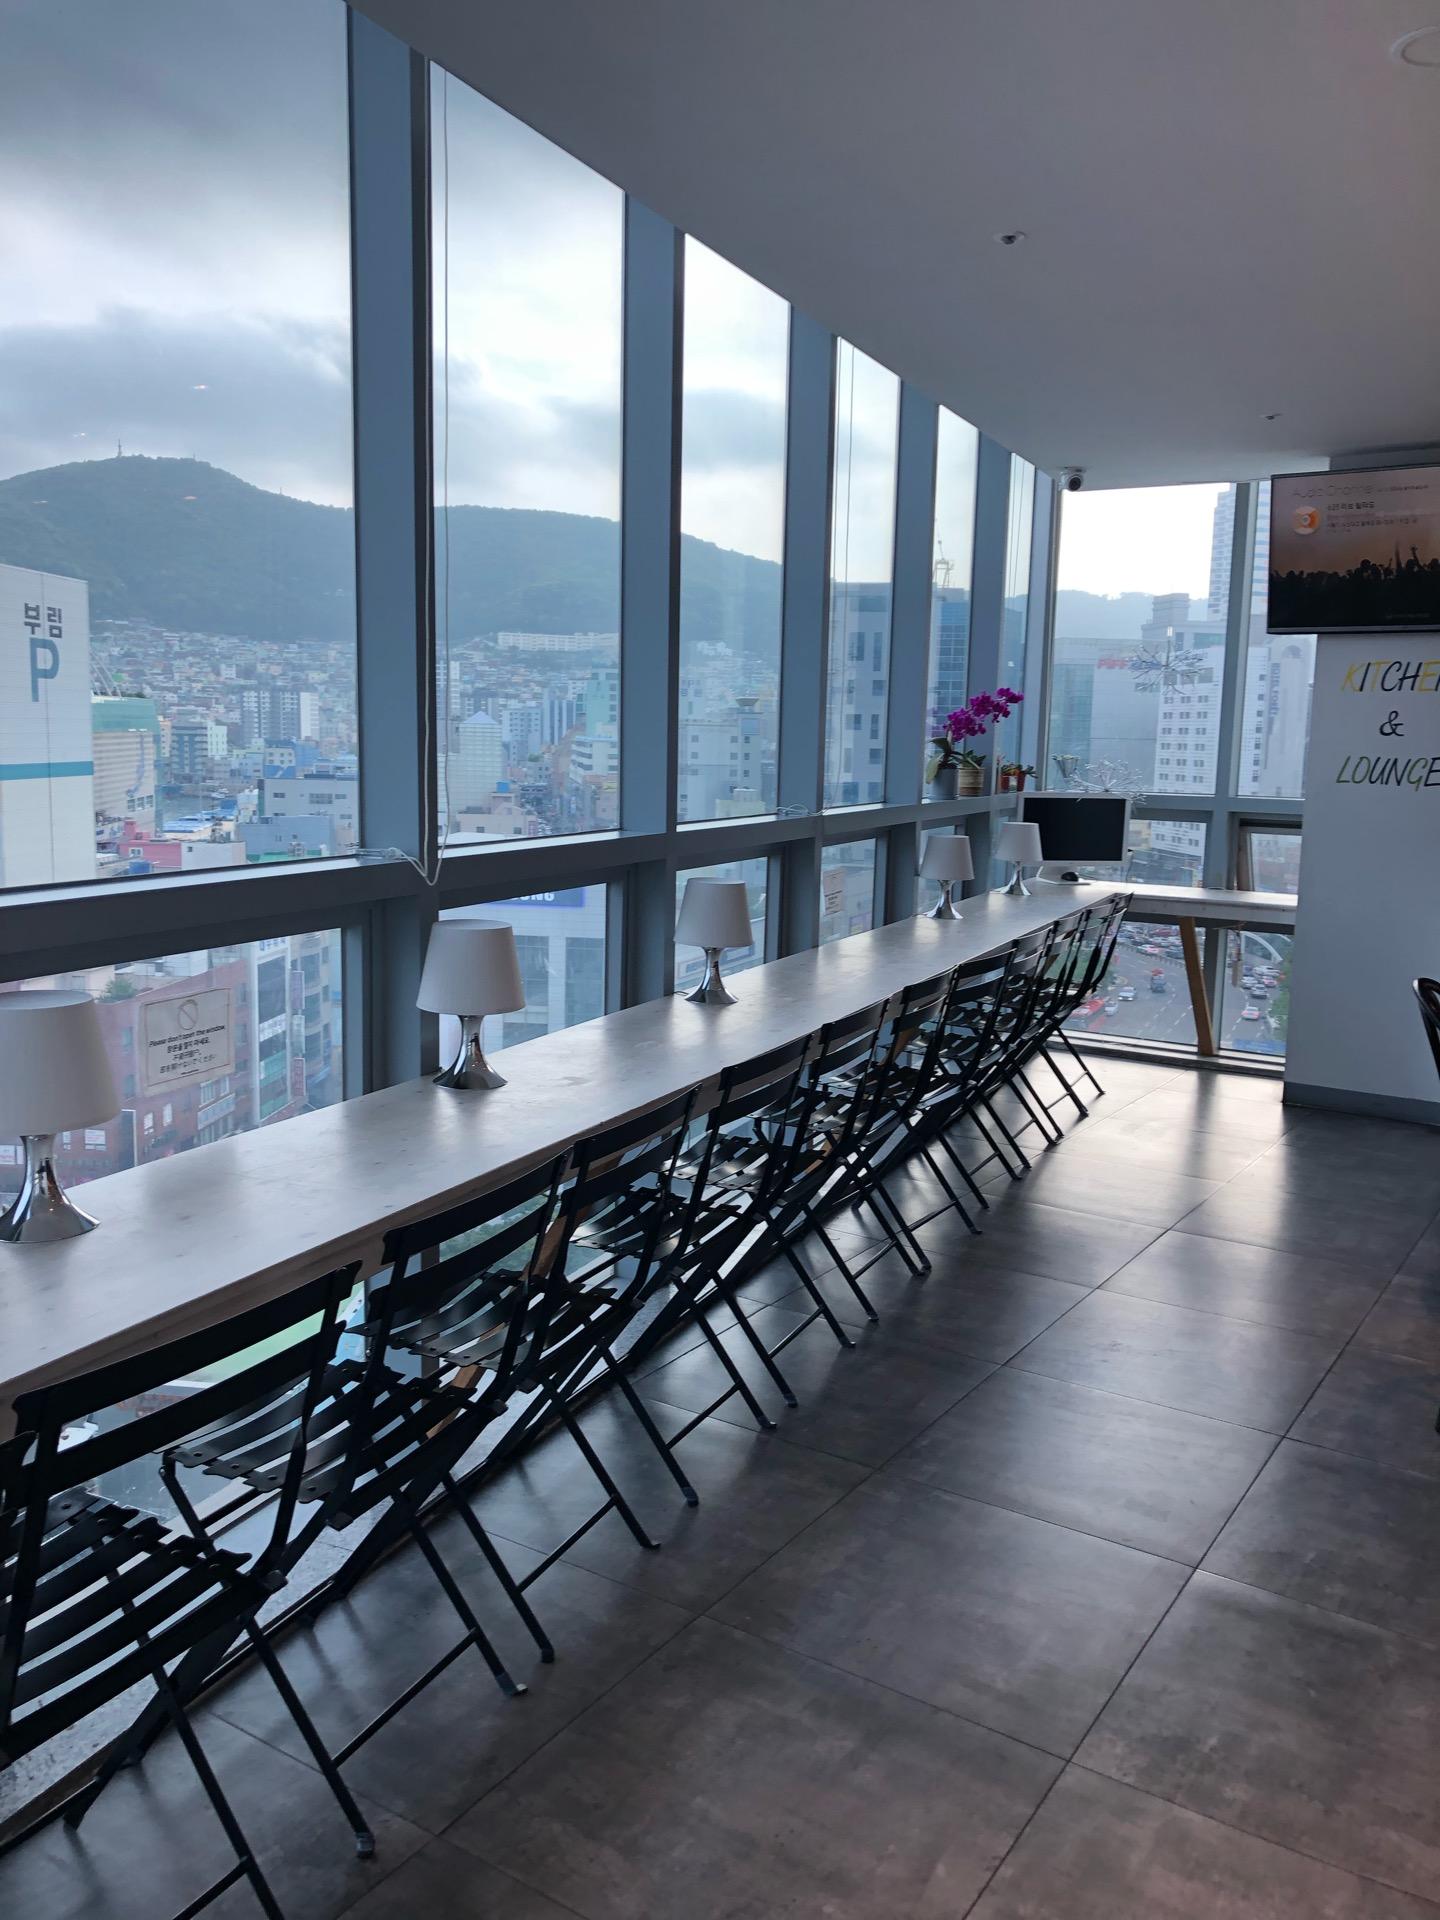 k-guesthouse nampo | Busan 부산 남포길 40-2 | +82 70-8848-3650